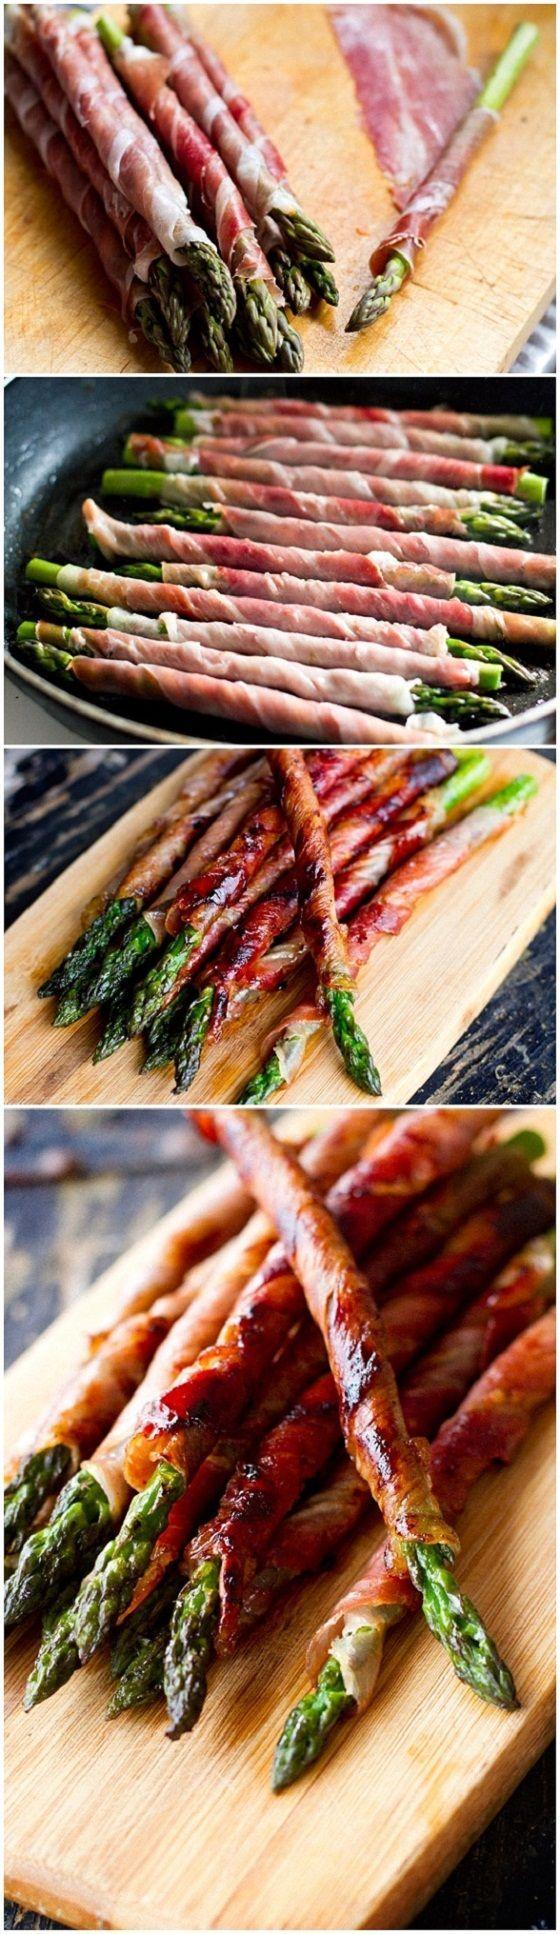 Prosciutto Wrapped Asparagus.